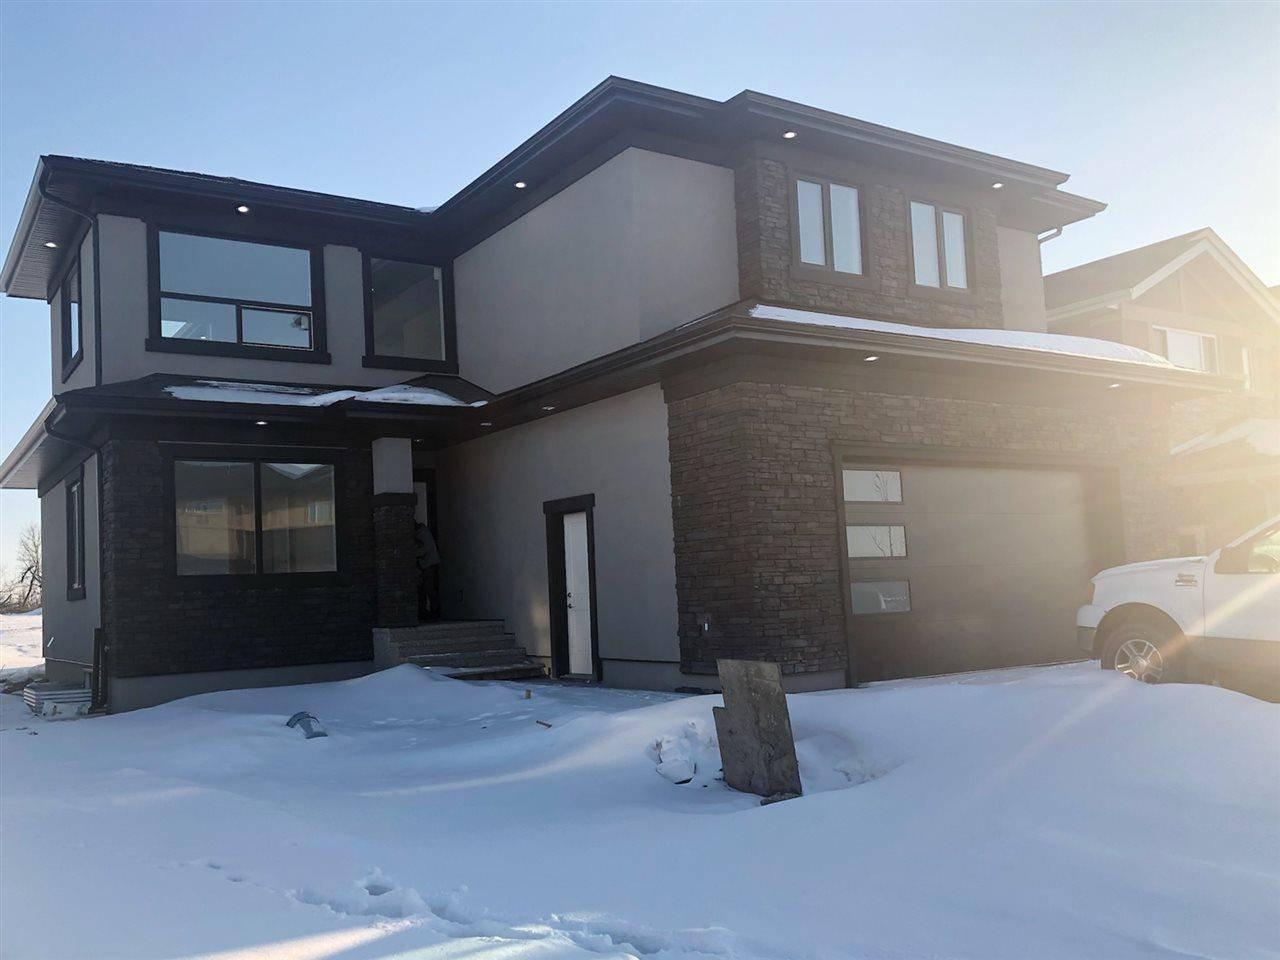 House for sale at 3524 Keswick Blvd Sw Edmonton Alberta - MLS: E4192517